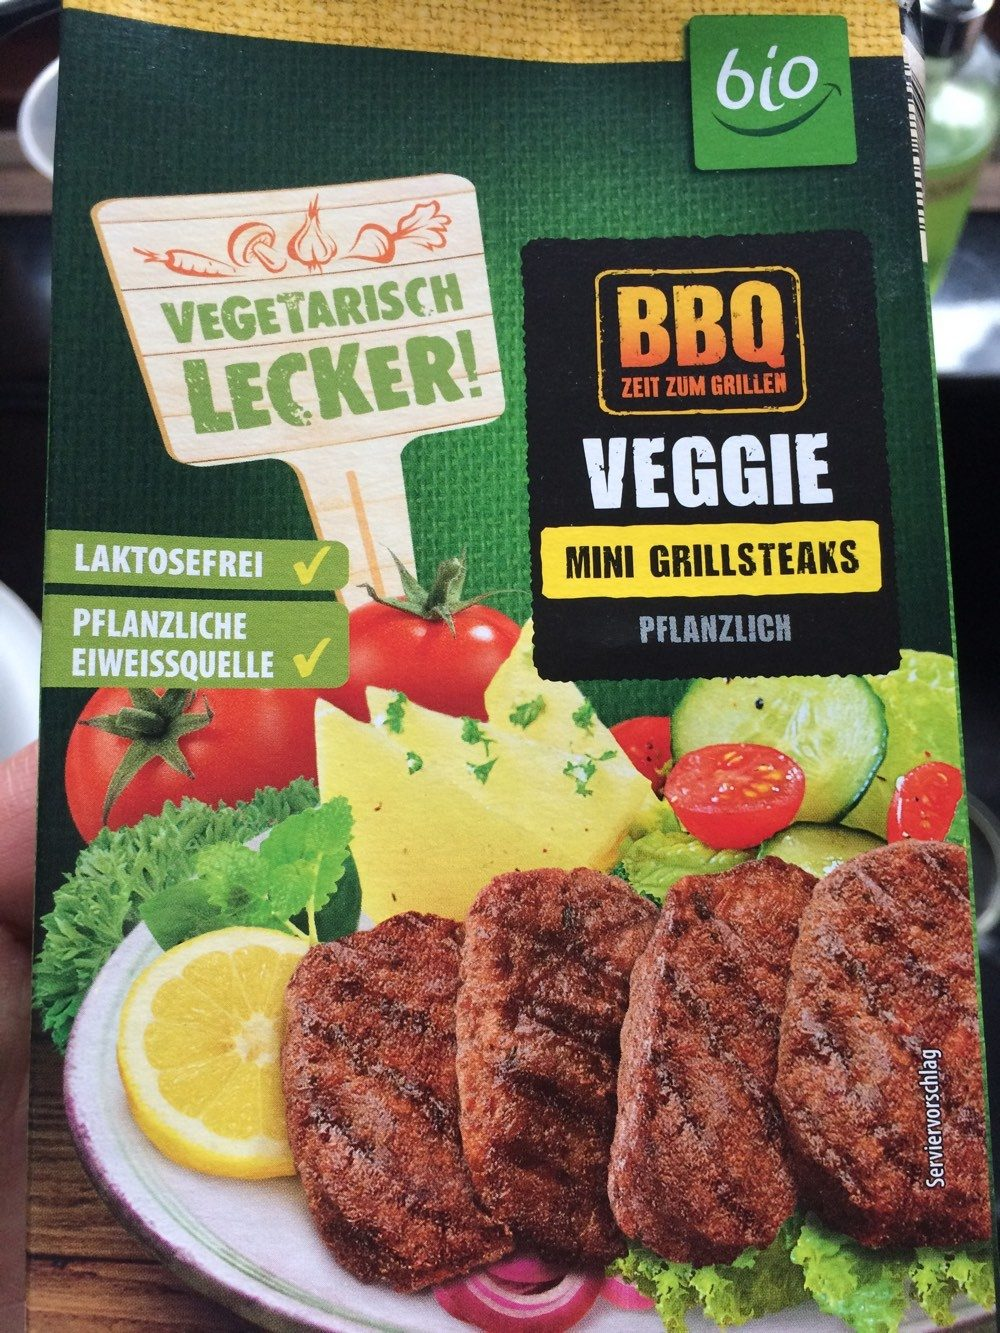 Veggie Mini Grillsteaks - Product - de